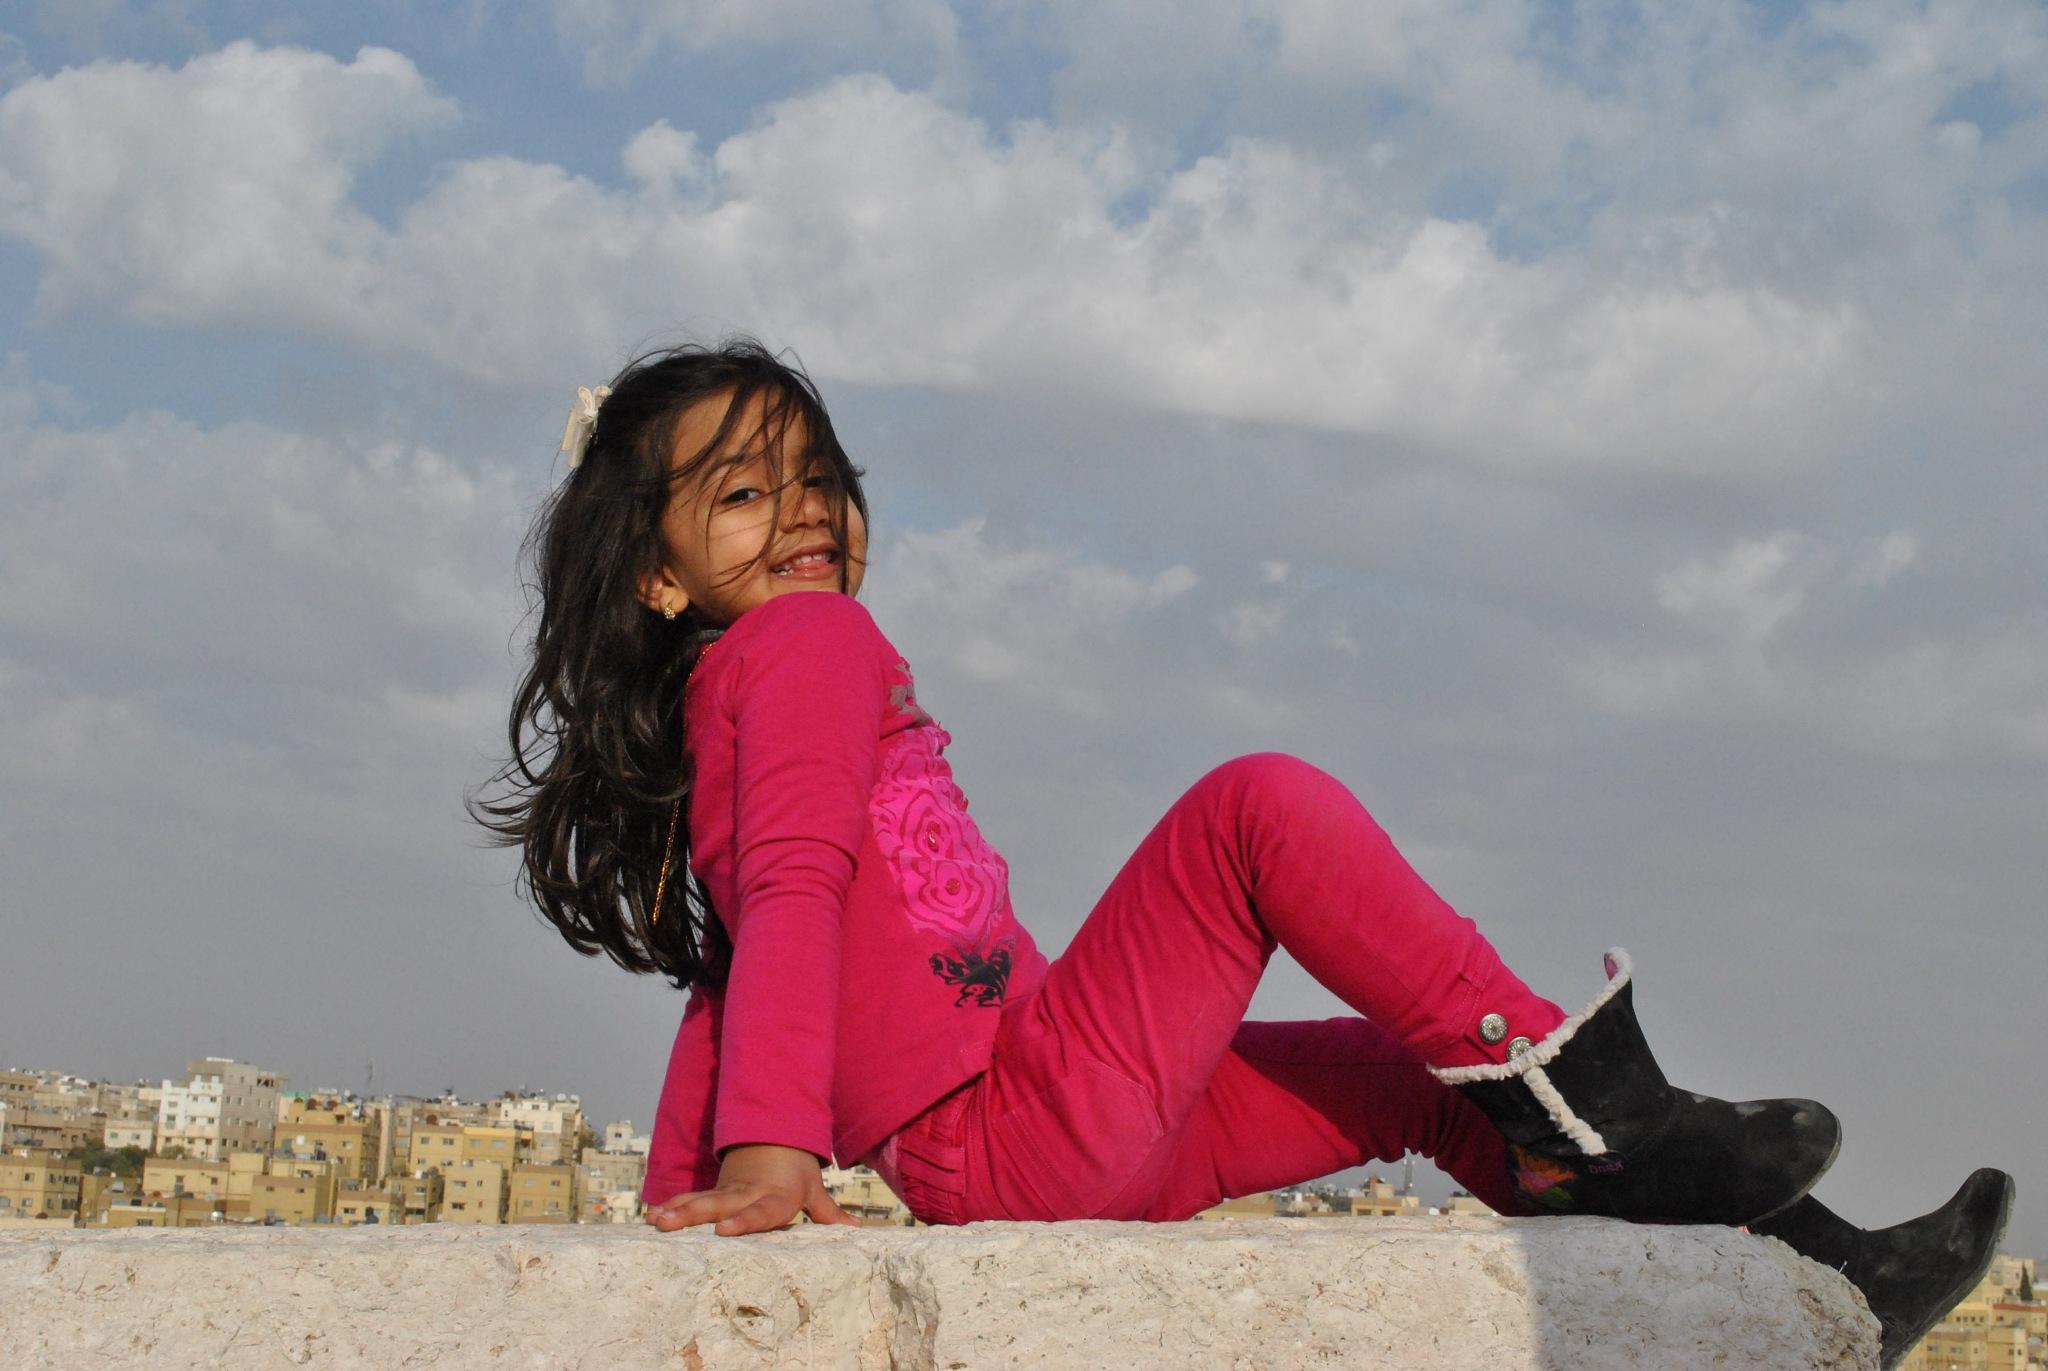 My princess  by Majdi Mohammed Karajoghly